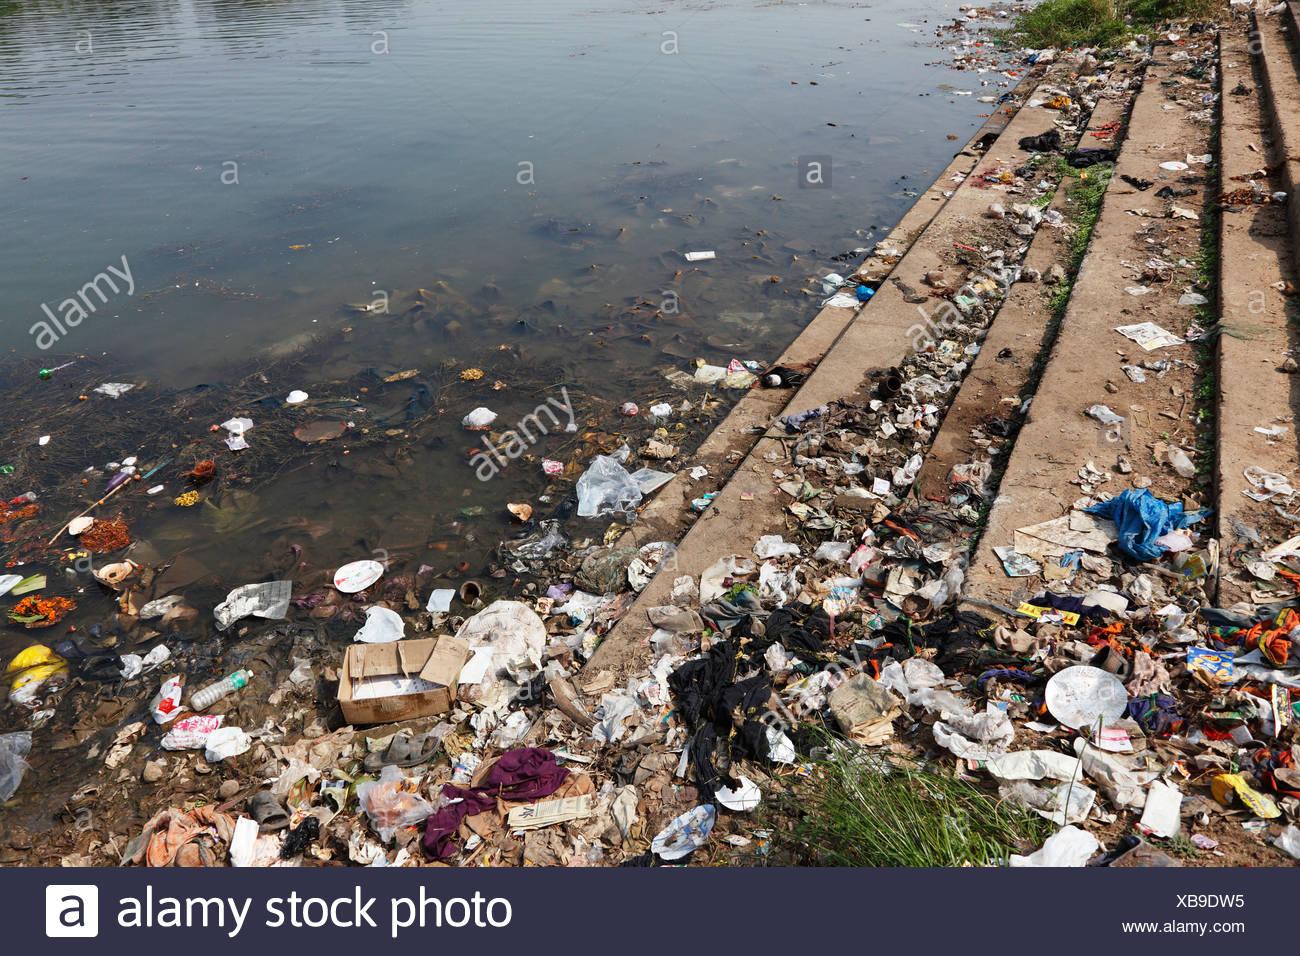 Garbage, dirty riverbank, Kapila, Kabini, Kabbani River, Nanjangud, Karnataka, South India, India, South Asia, Asia - Stock Image